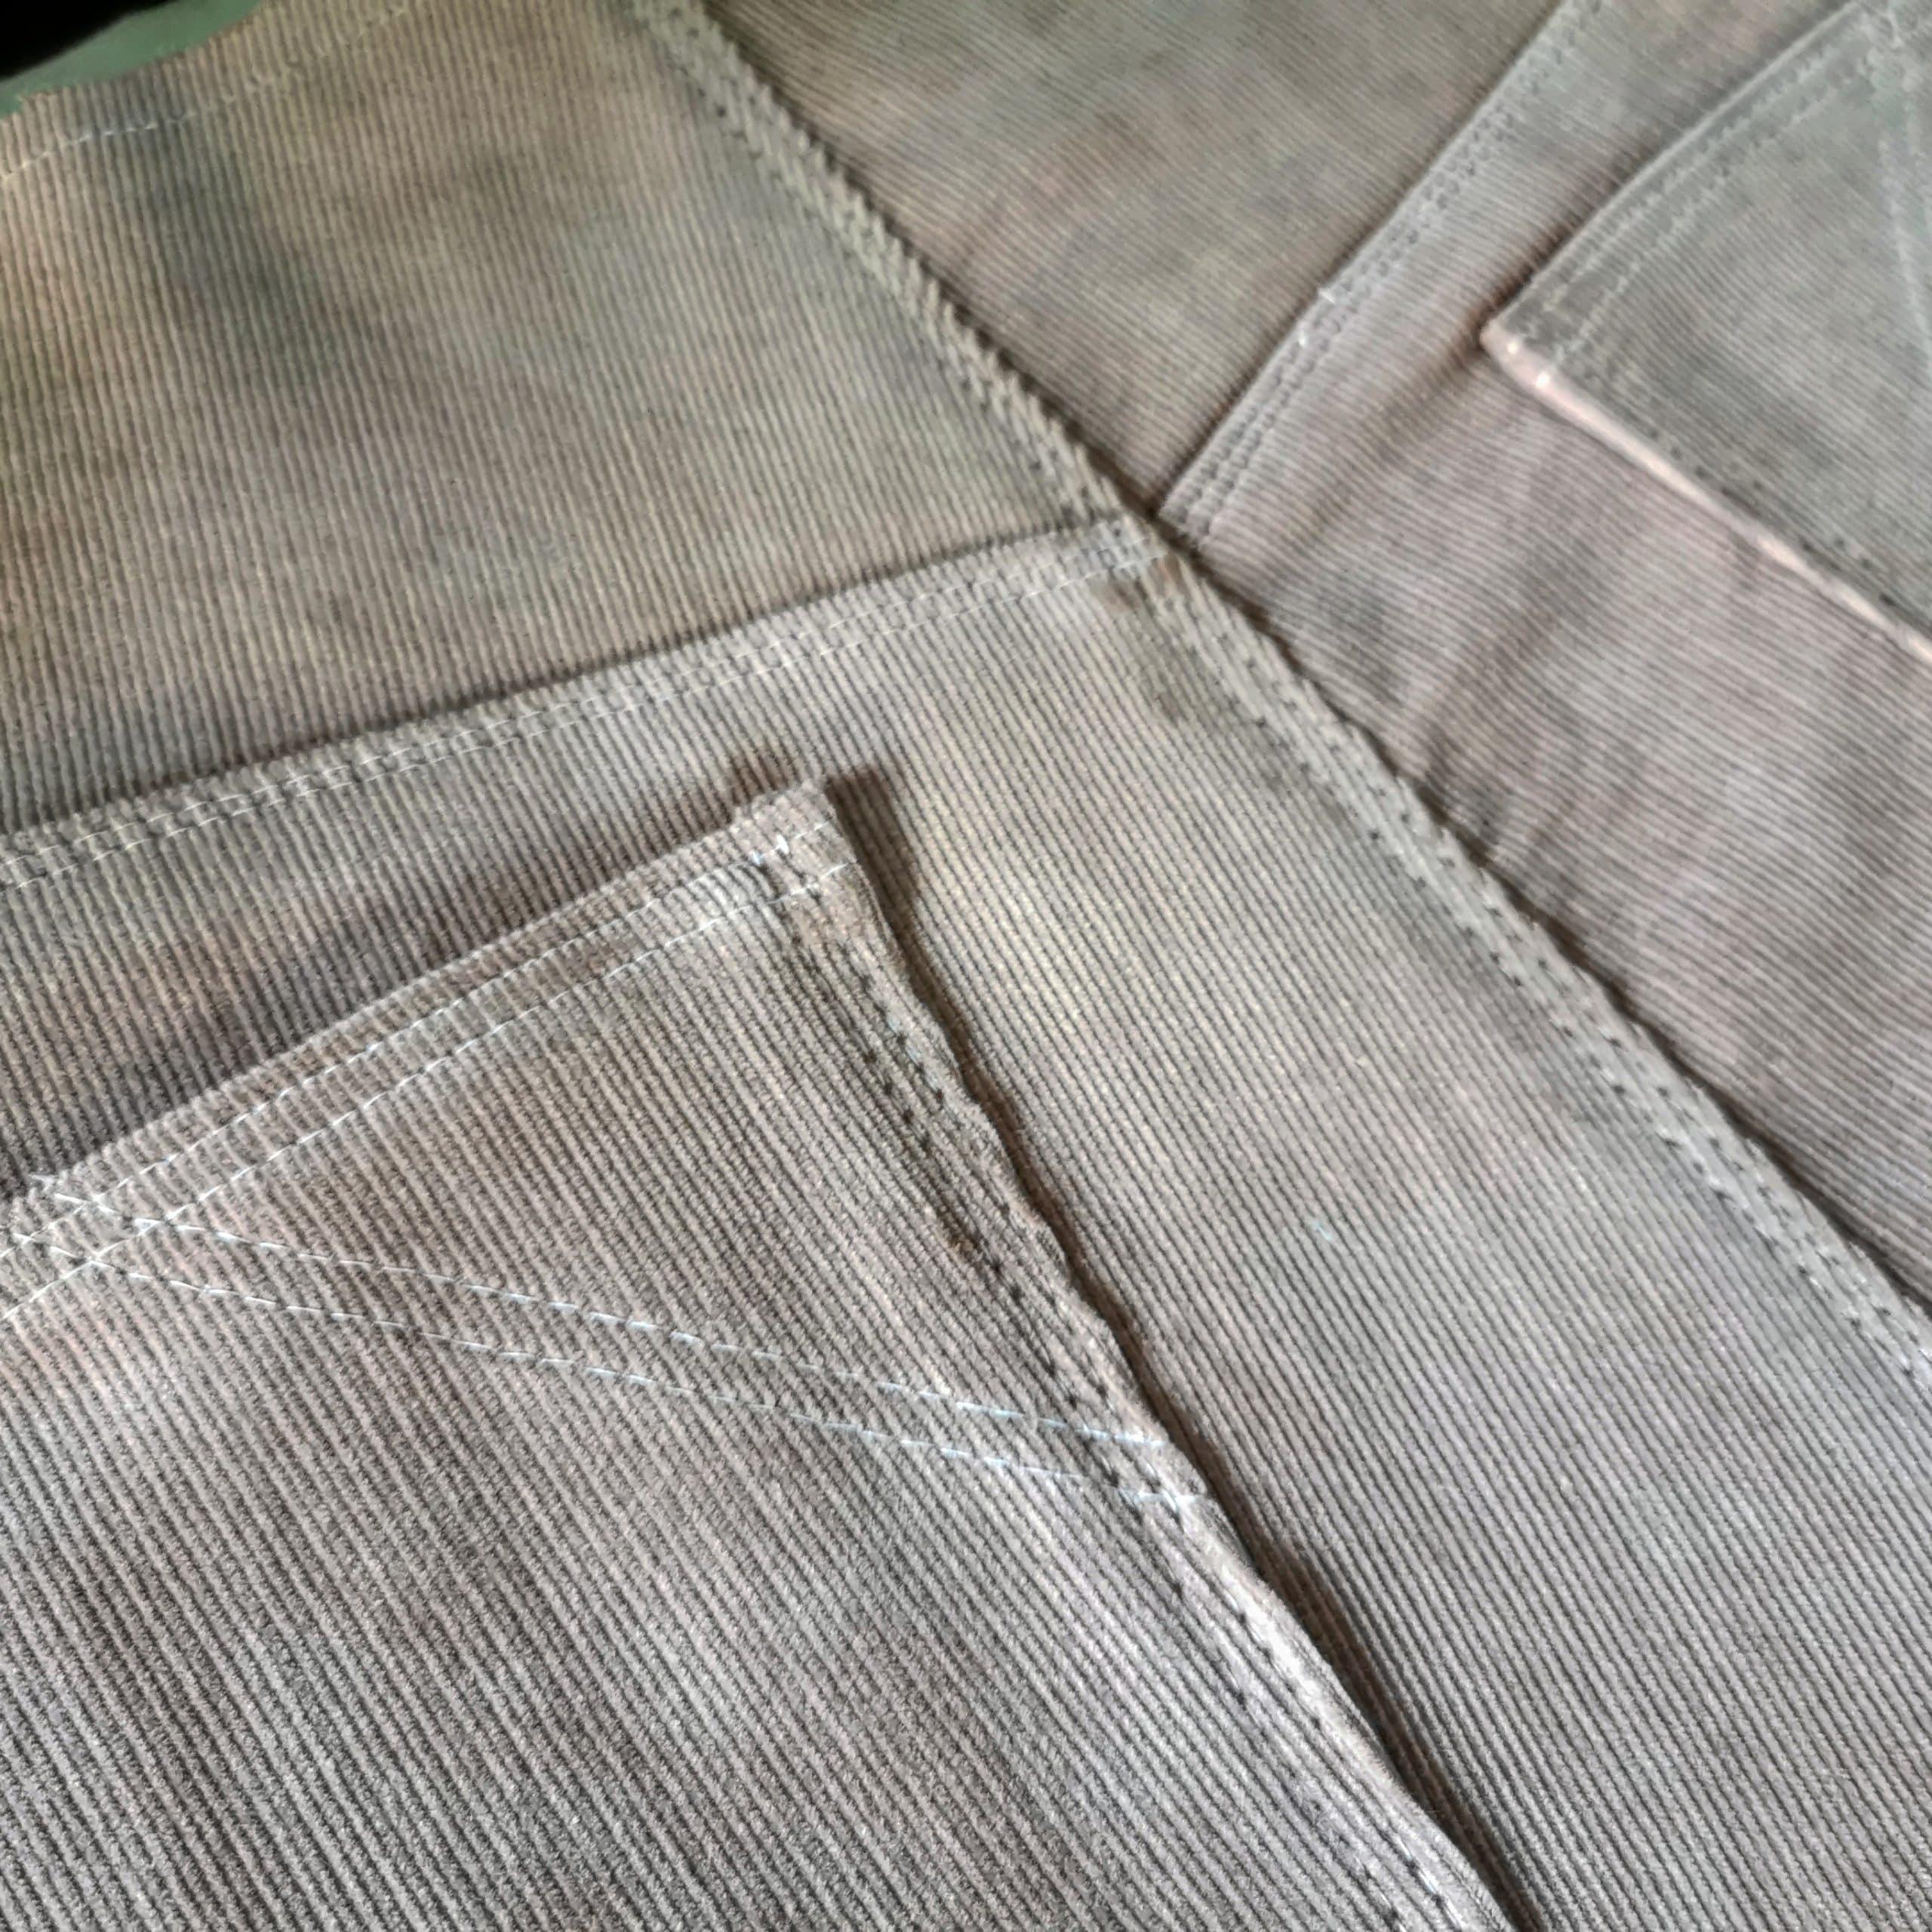 megan nielsen dawn jeans by cara sosewmad